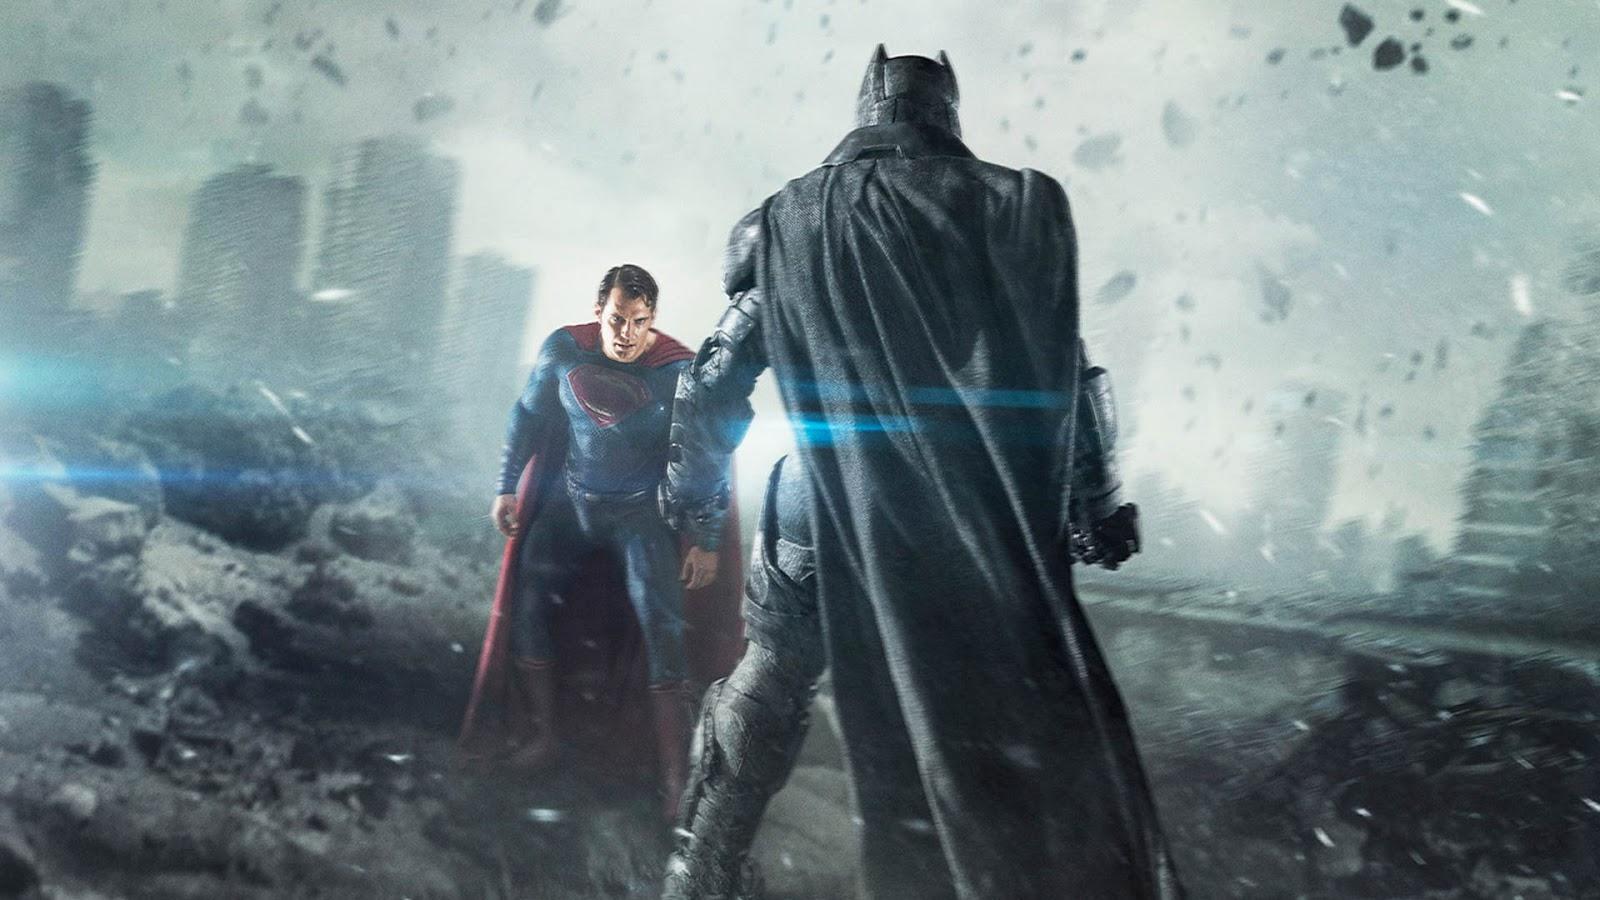 Framboesa de Ouro: Batman vs Superman brilha e torna-se o grande vencedor - GeekBlast